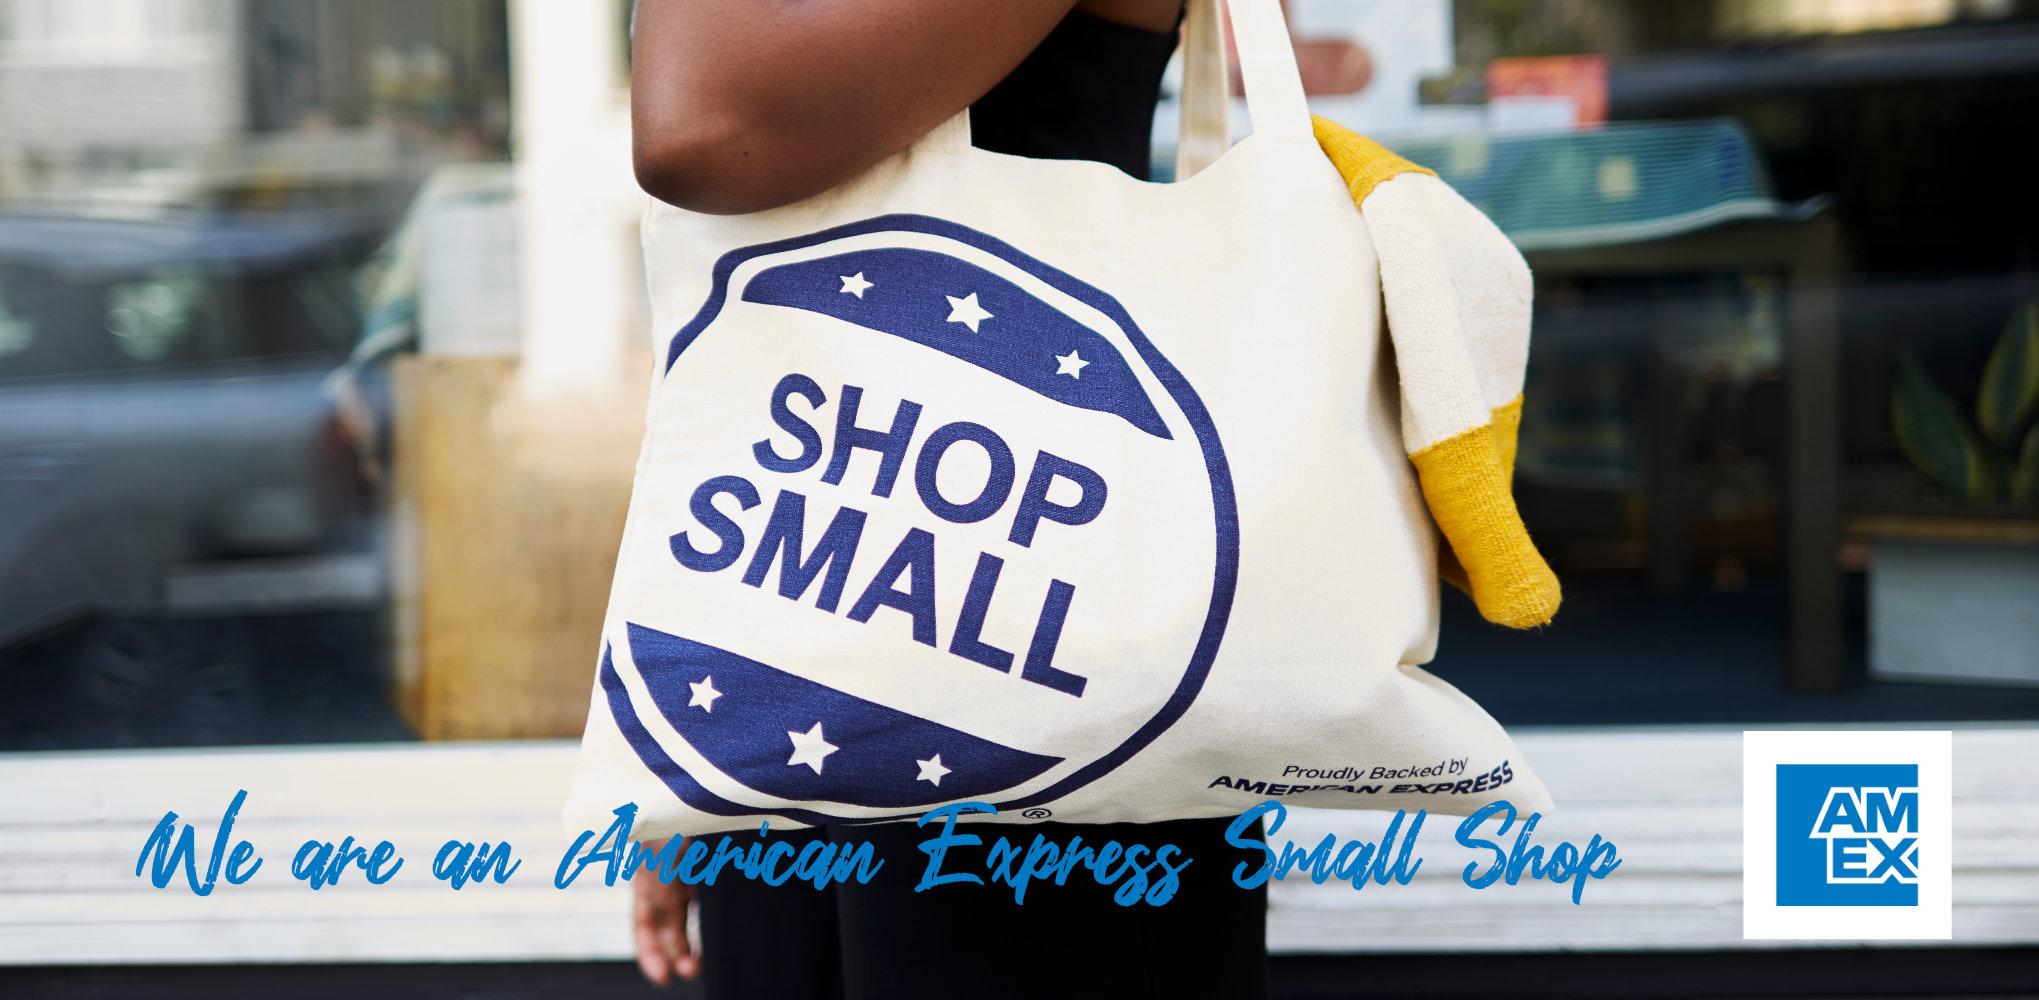 Elmstock is a AMEX Small Shop